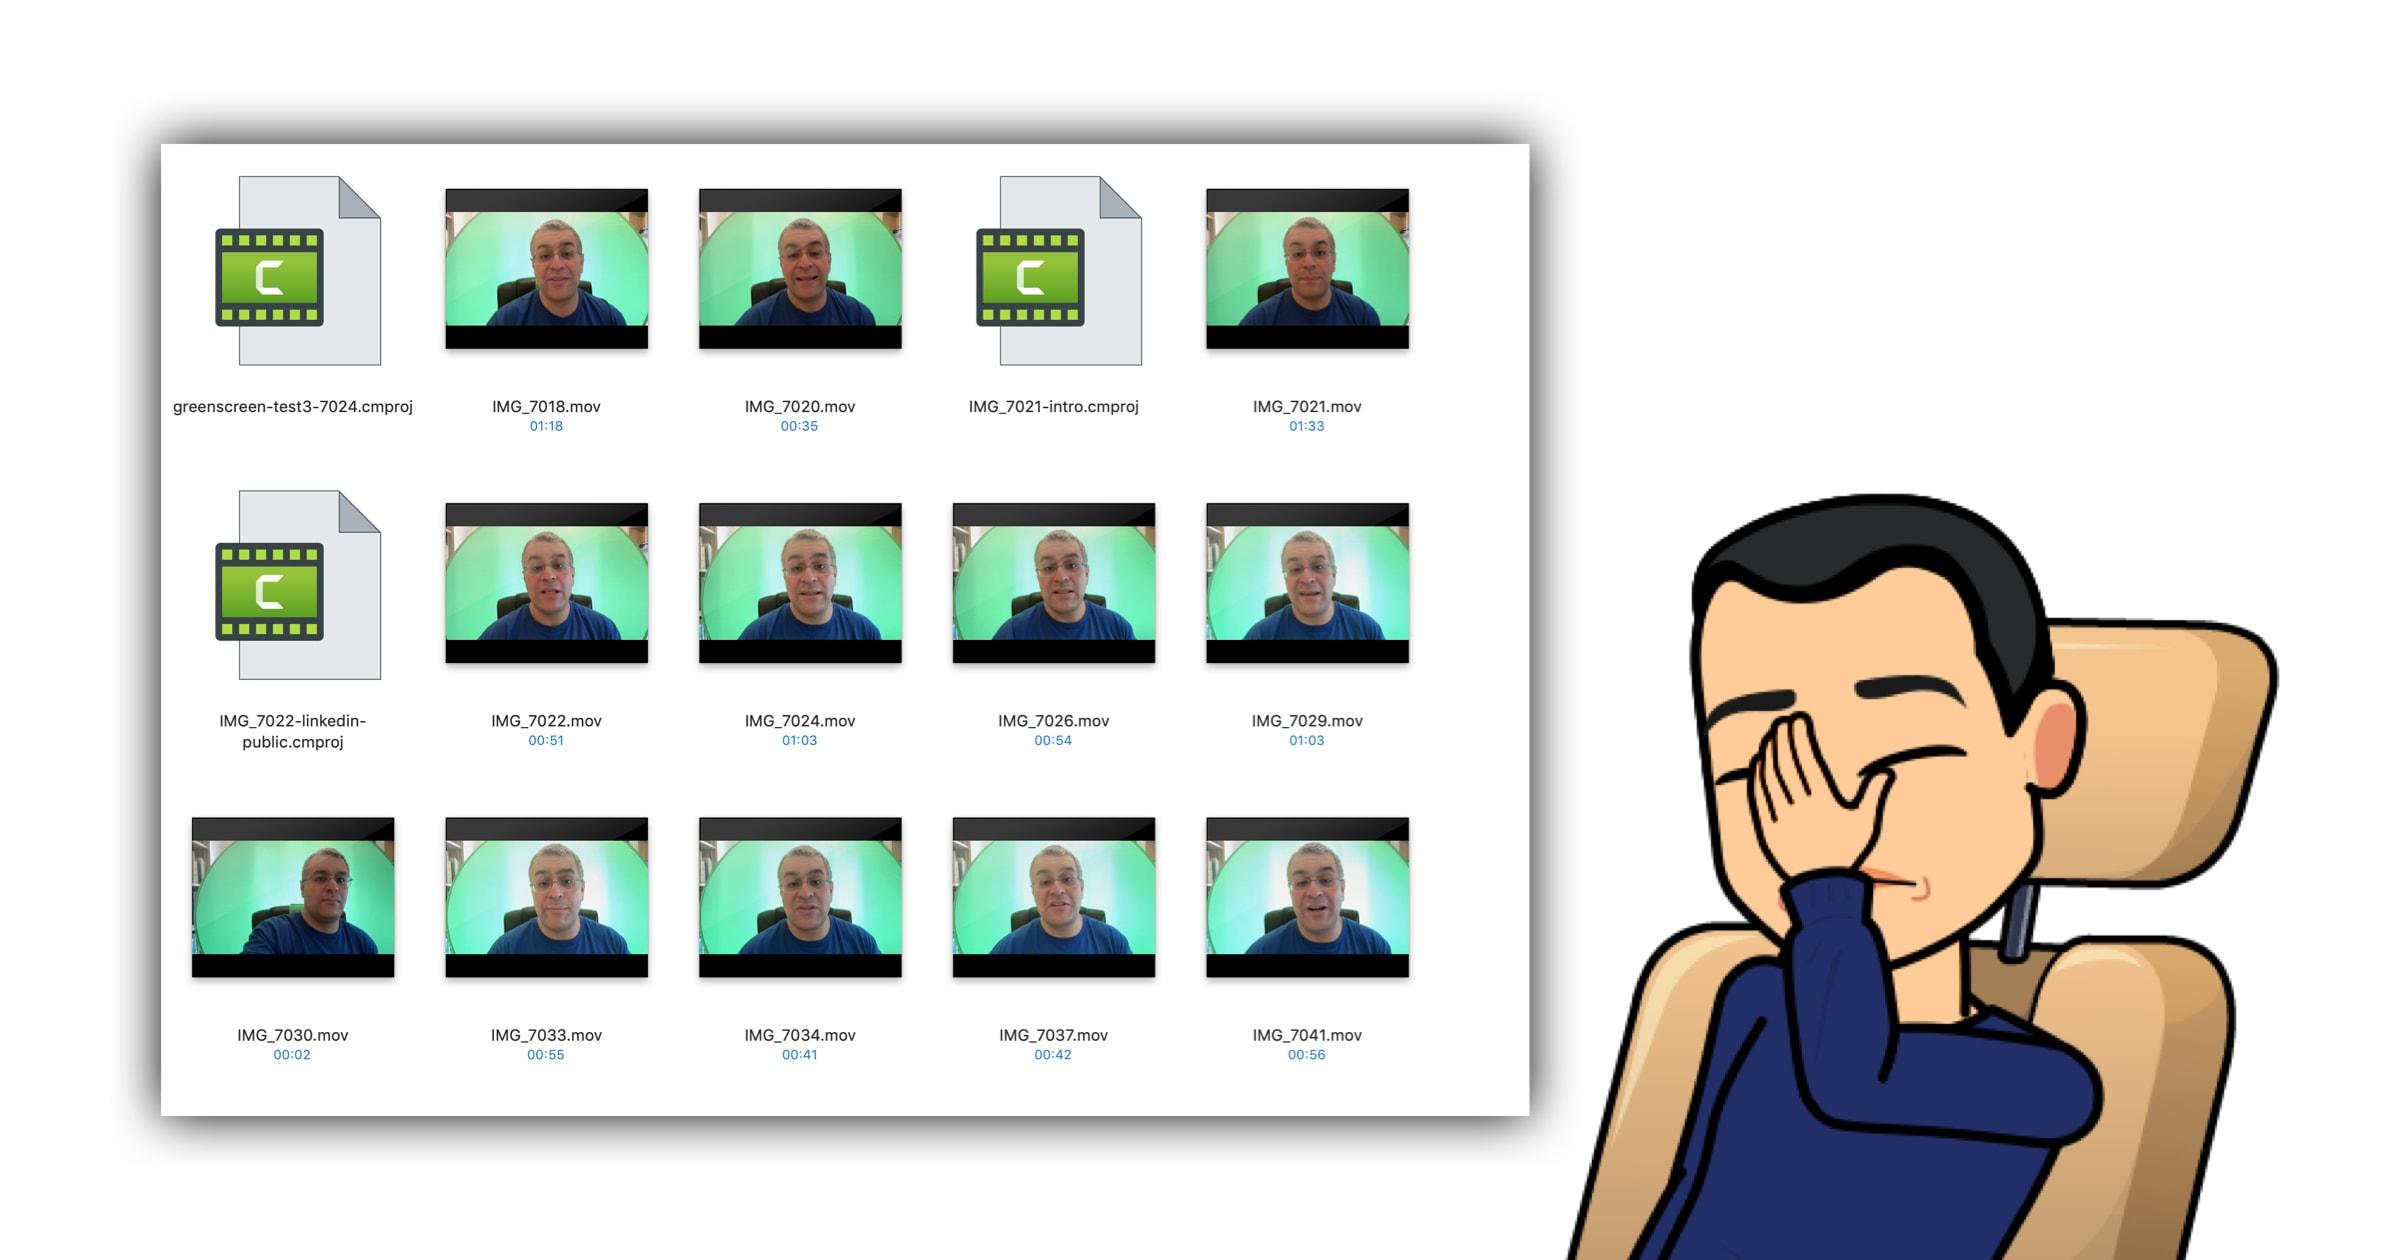 Green screen failures